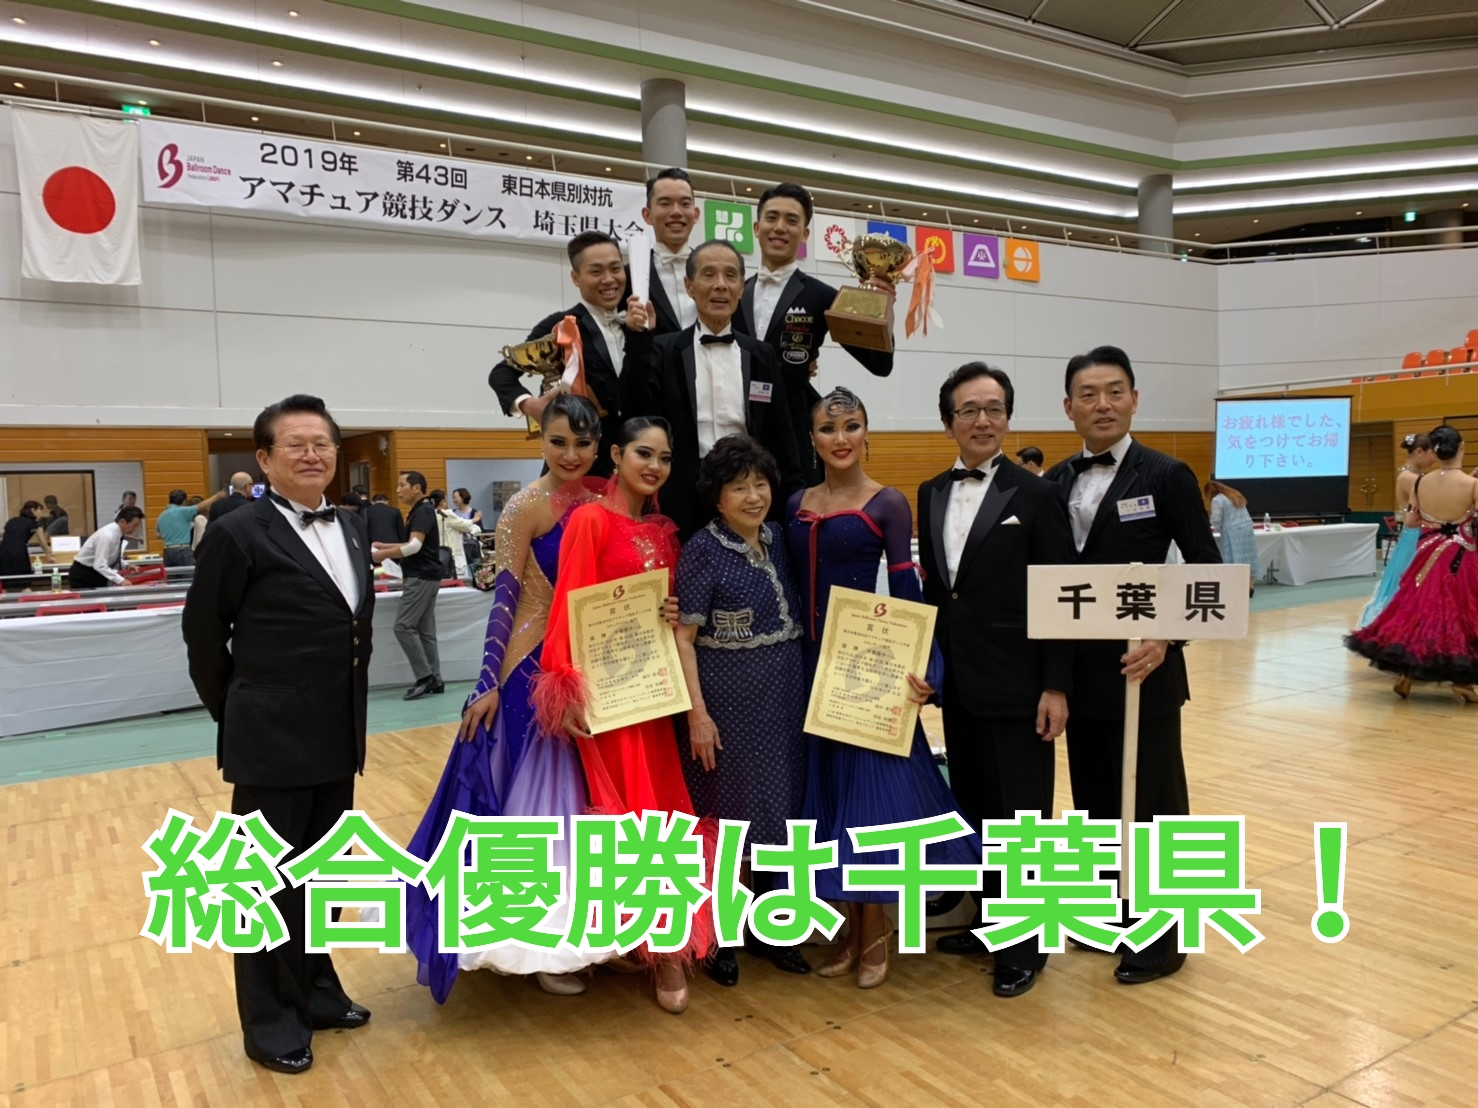 東日本アマチュア県別対抗戦|JBDF|2019年|埼玉大会